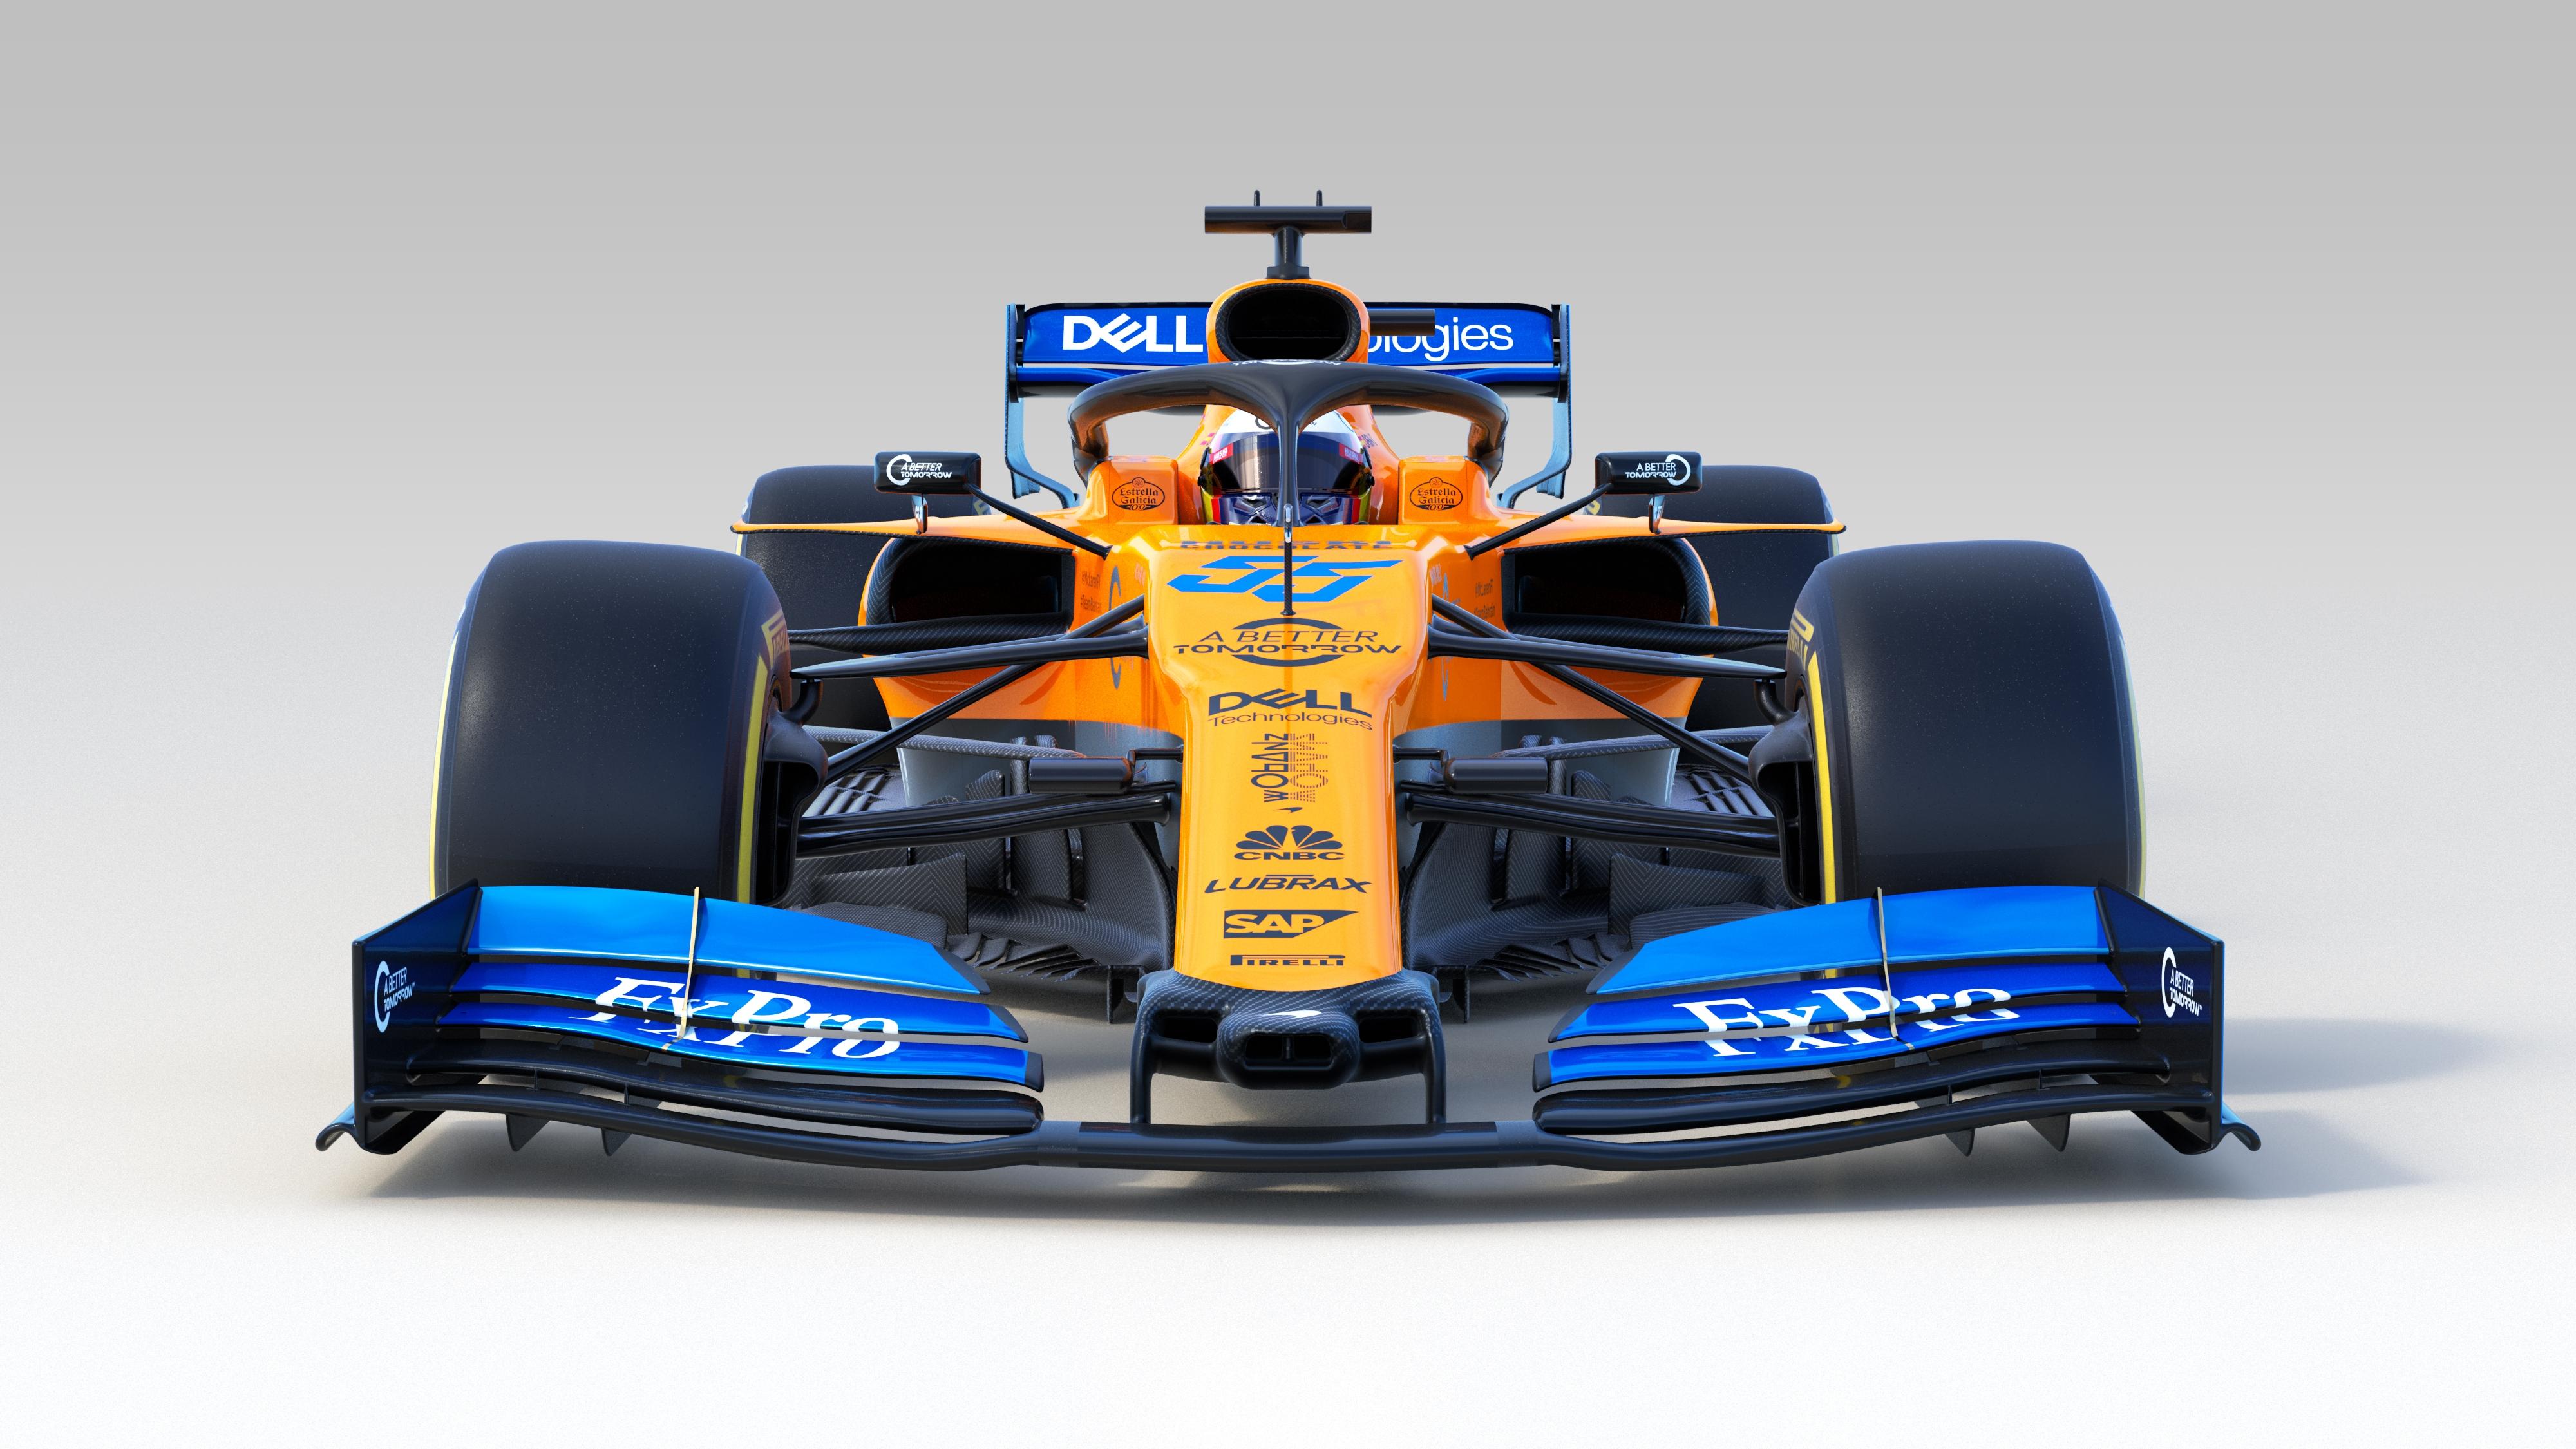 Download 4000x2250 Formula 1 F1 Cars Mclaren Mcl34 Wallpapers 4000x2250